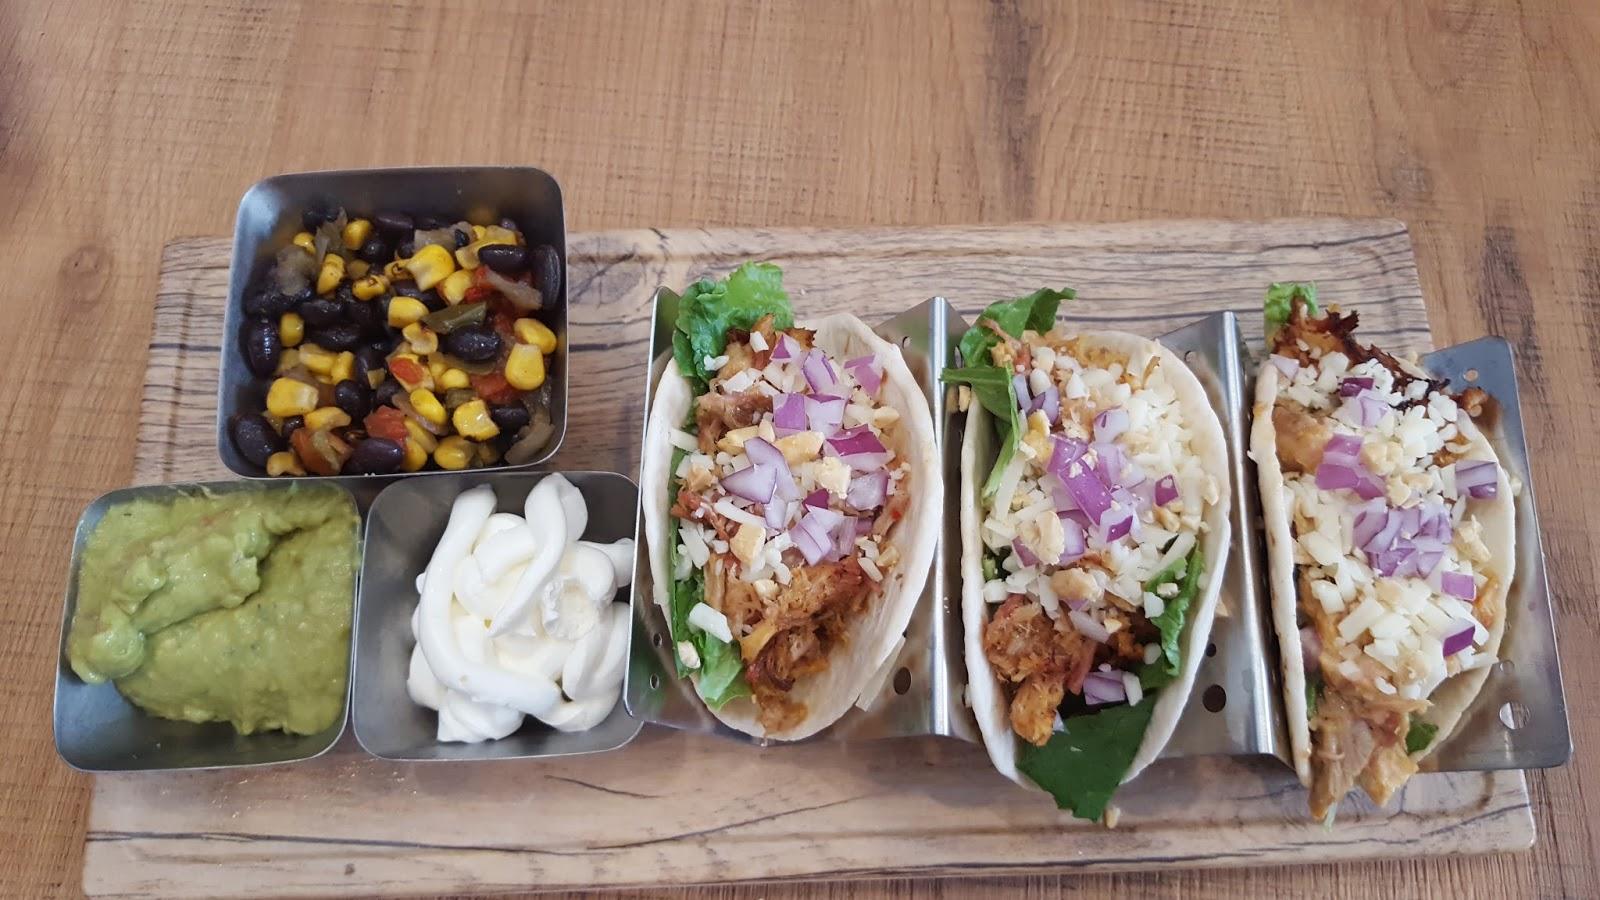 Hyatt Place Ann Arbor tacos